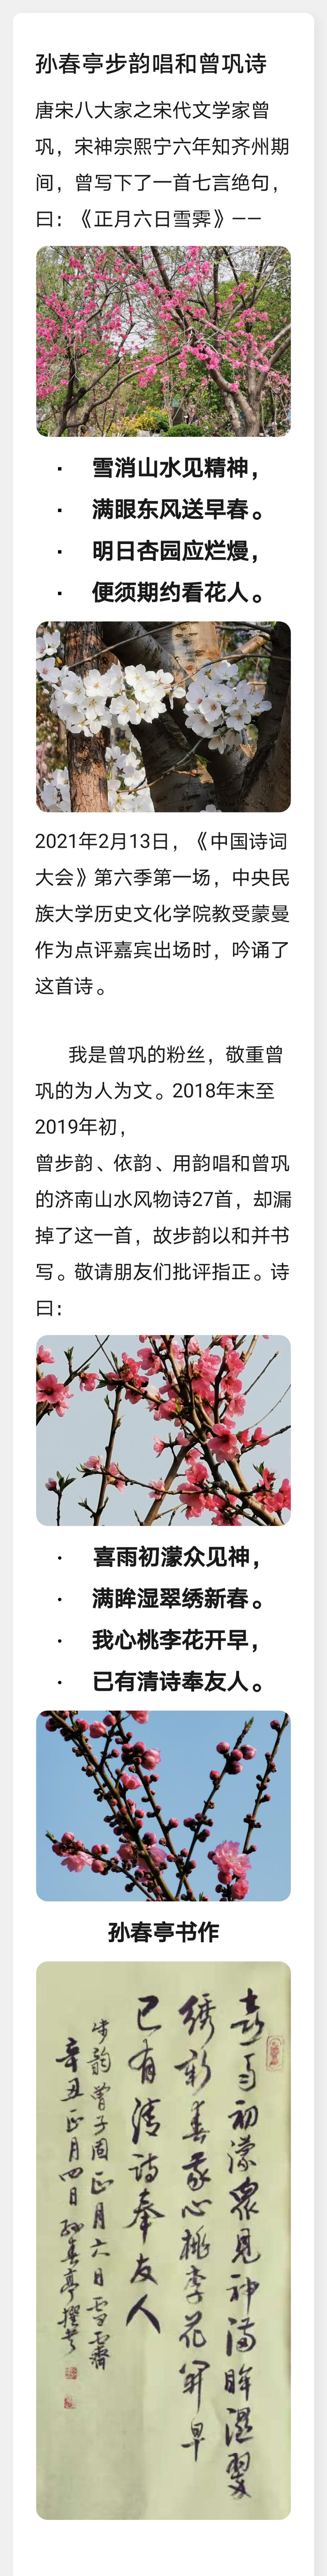 Notepad_202102161243_58254_edit_15888375015803